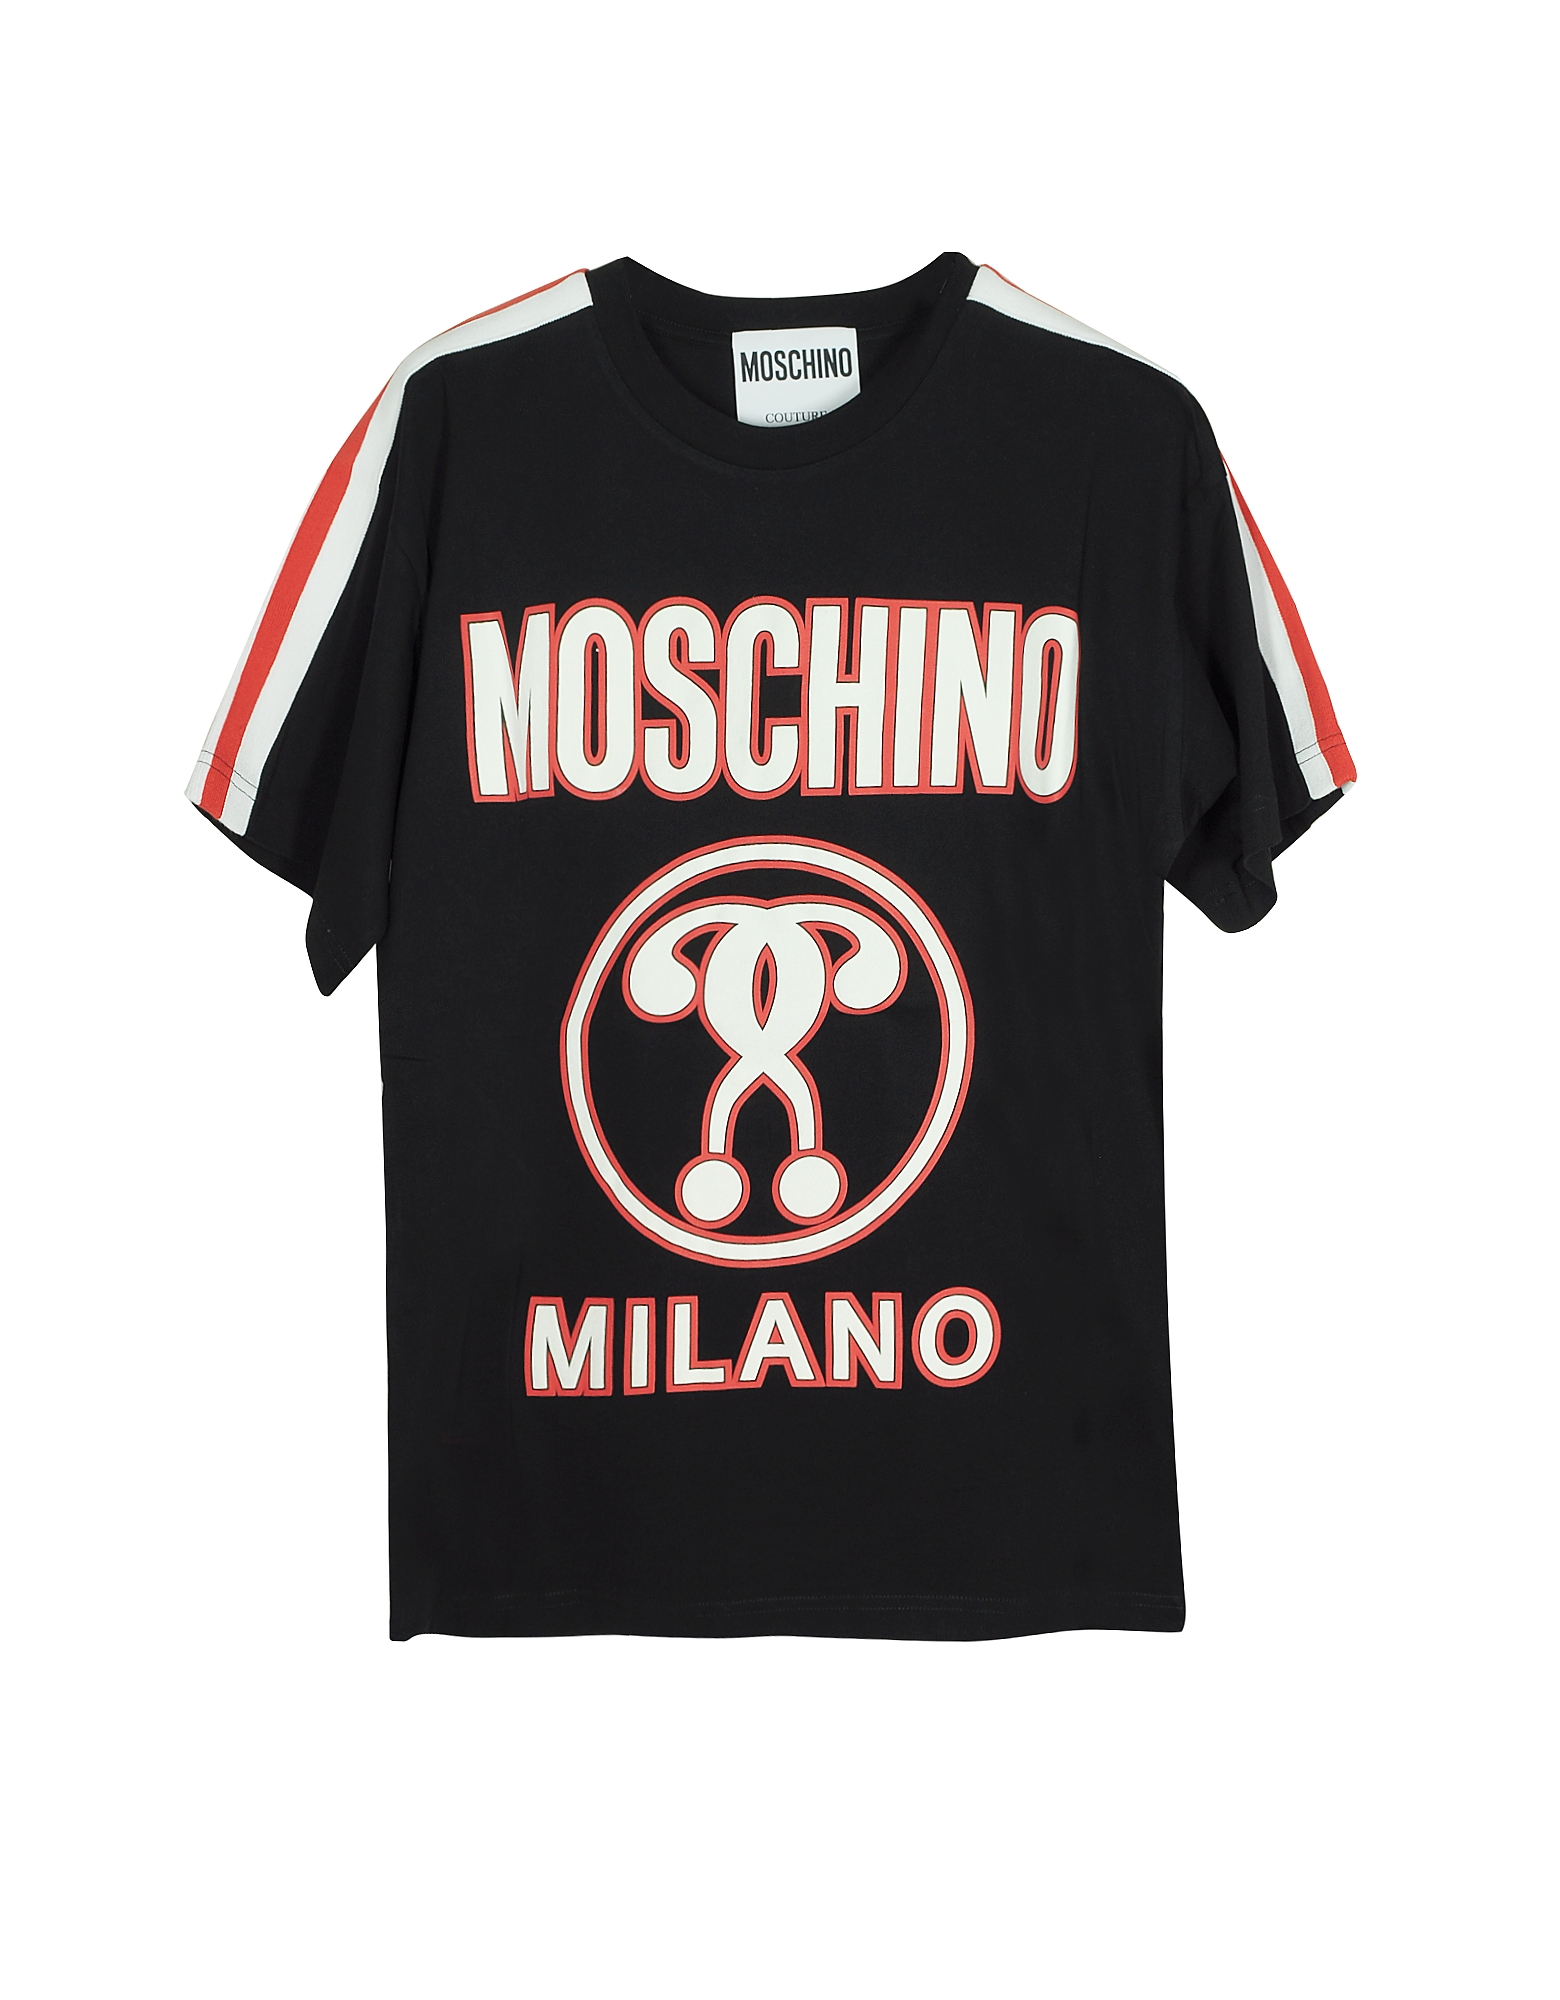 Moschino Designer T-Shirts & Tops, Black Signature Print Cotton Oversized Women's T-Shirt